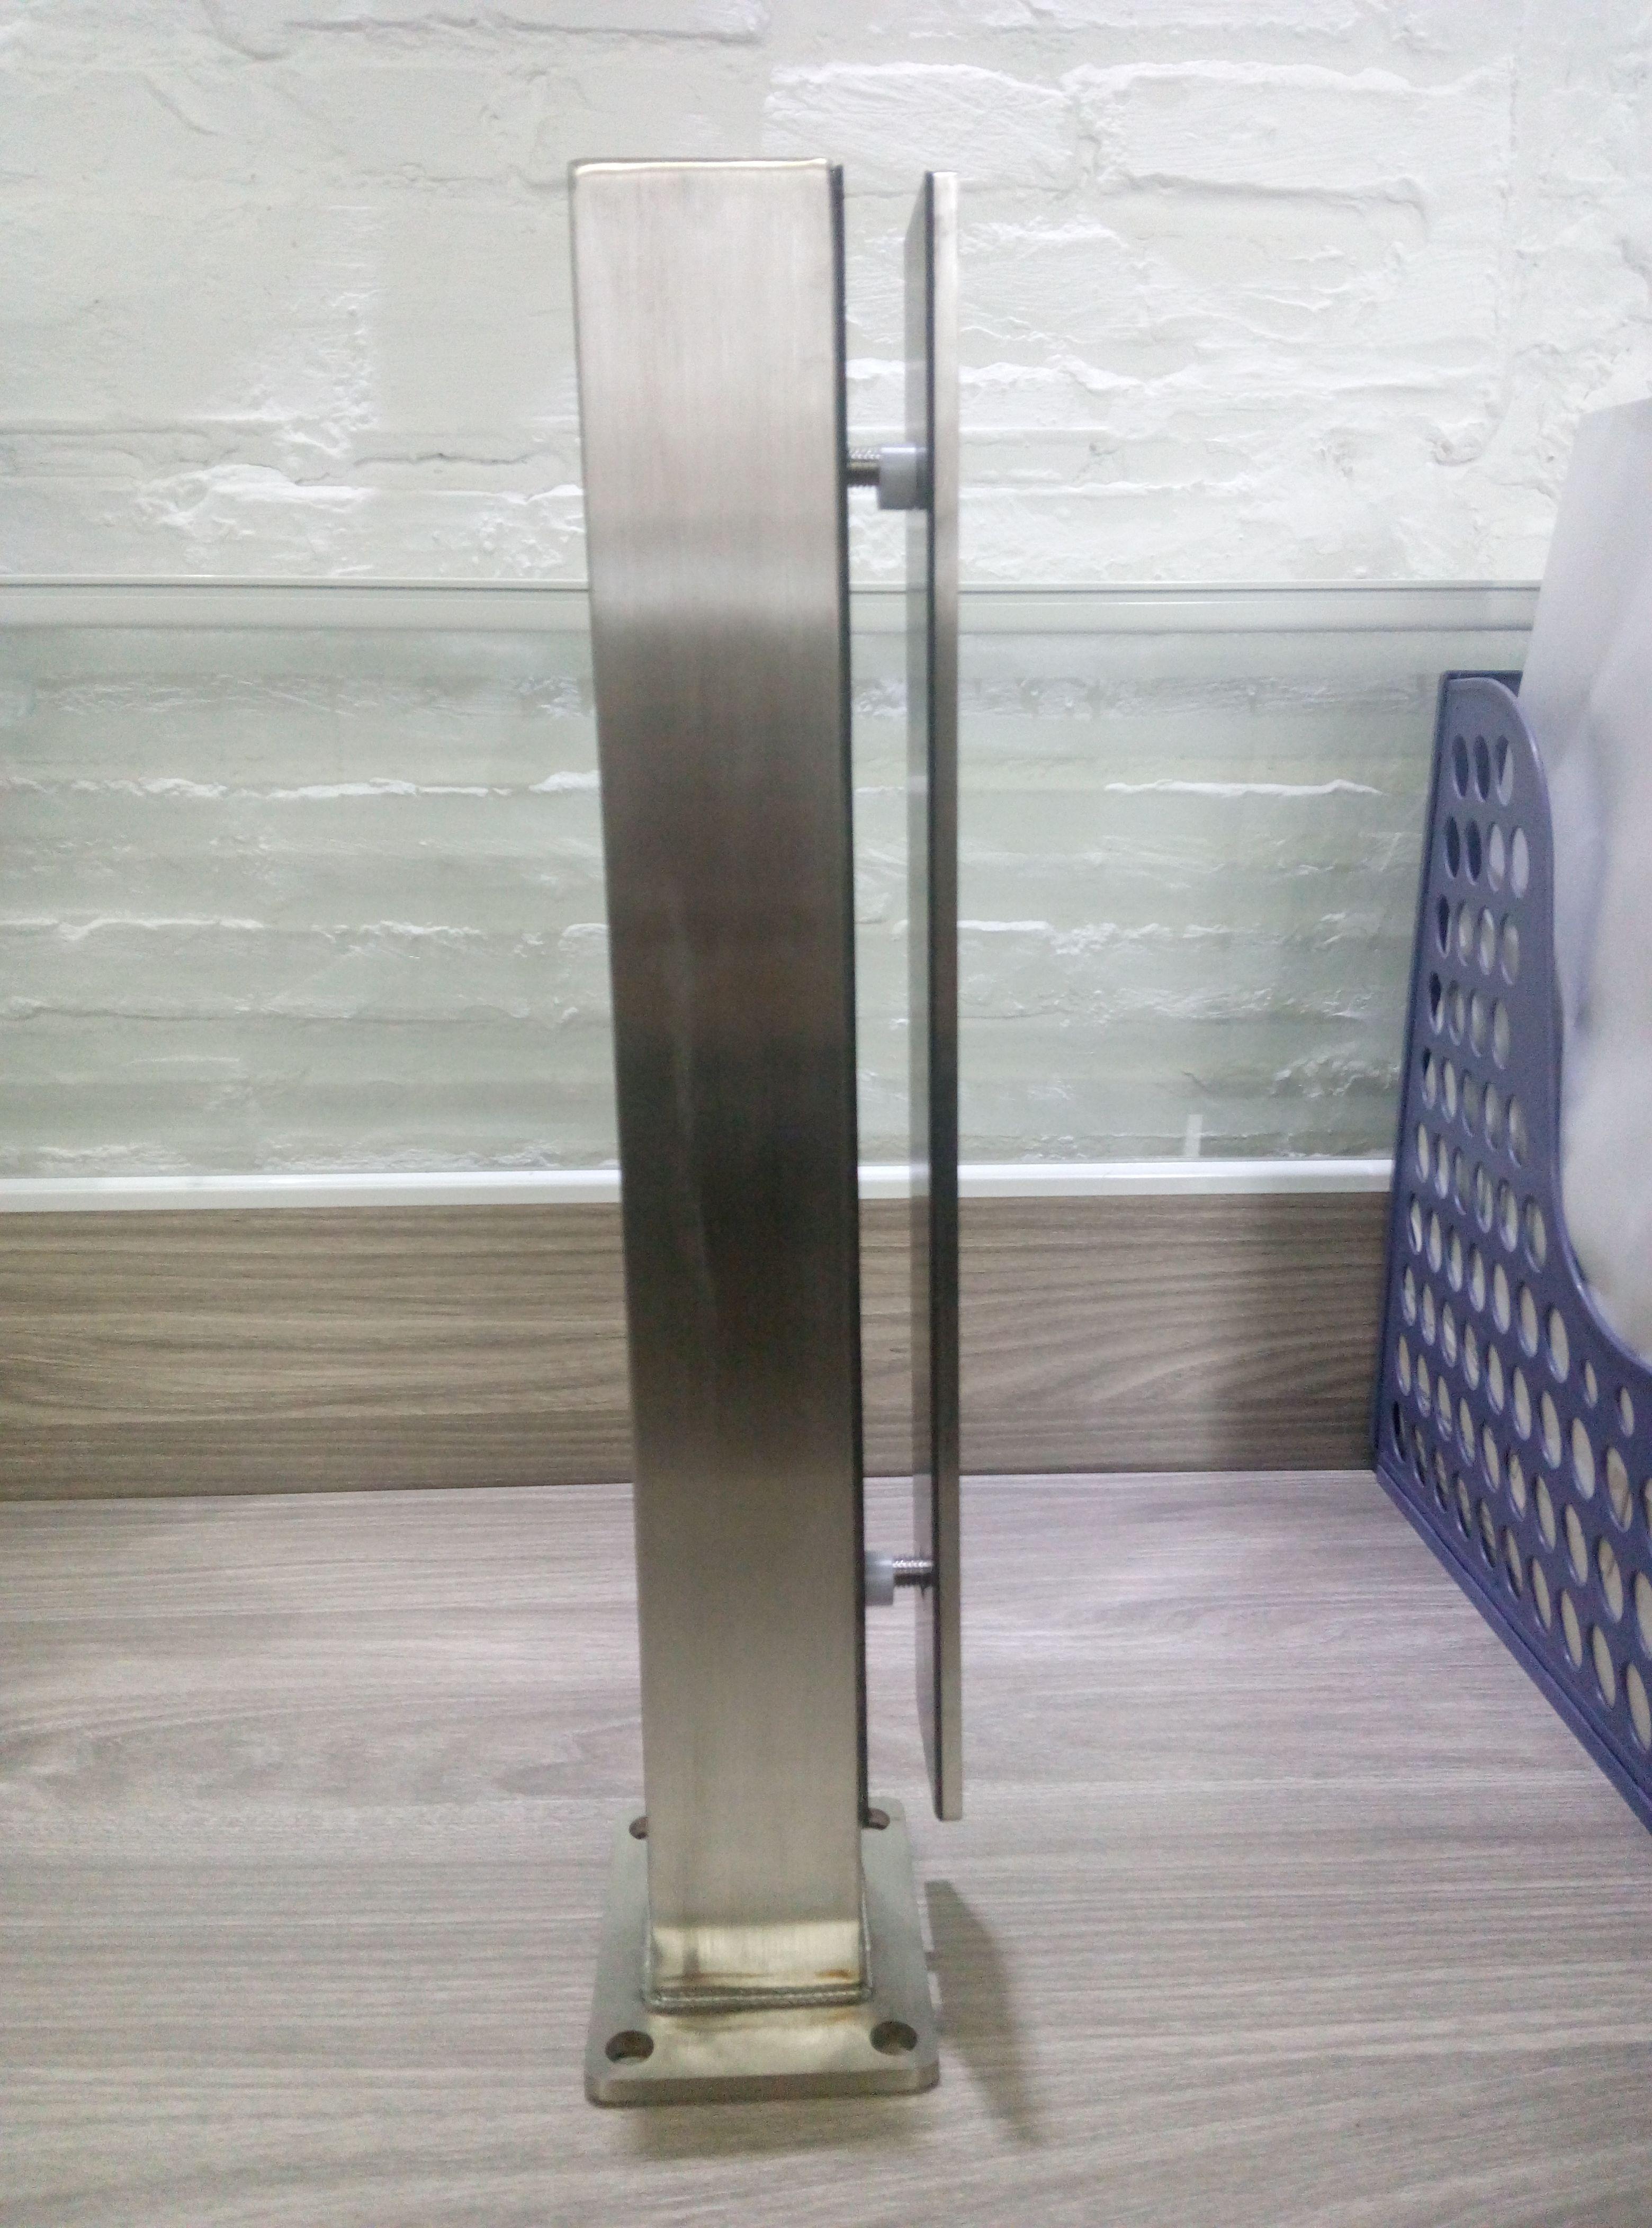 Stainless Steel Short Mini Post From China Supplier Shenzhen Launch Co Ltd Stainless Steel Railing Glass Balustrade Steel Railing